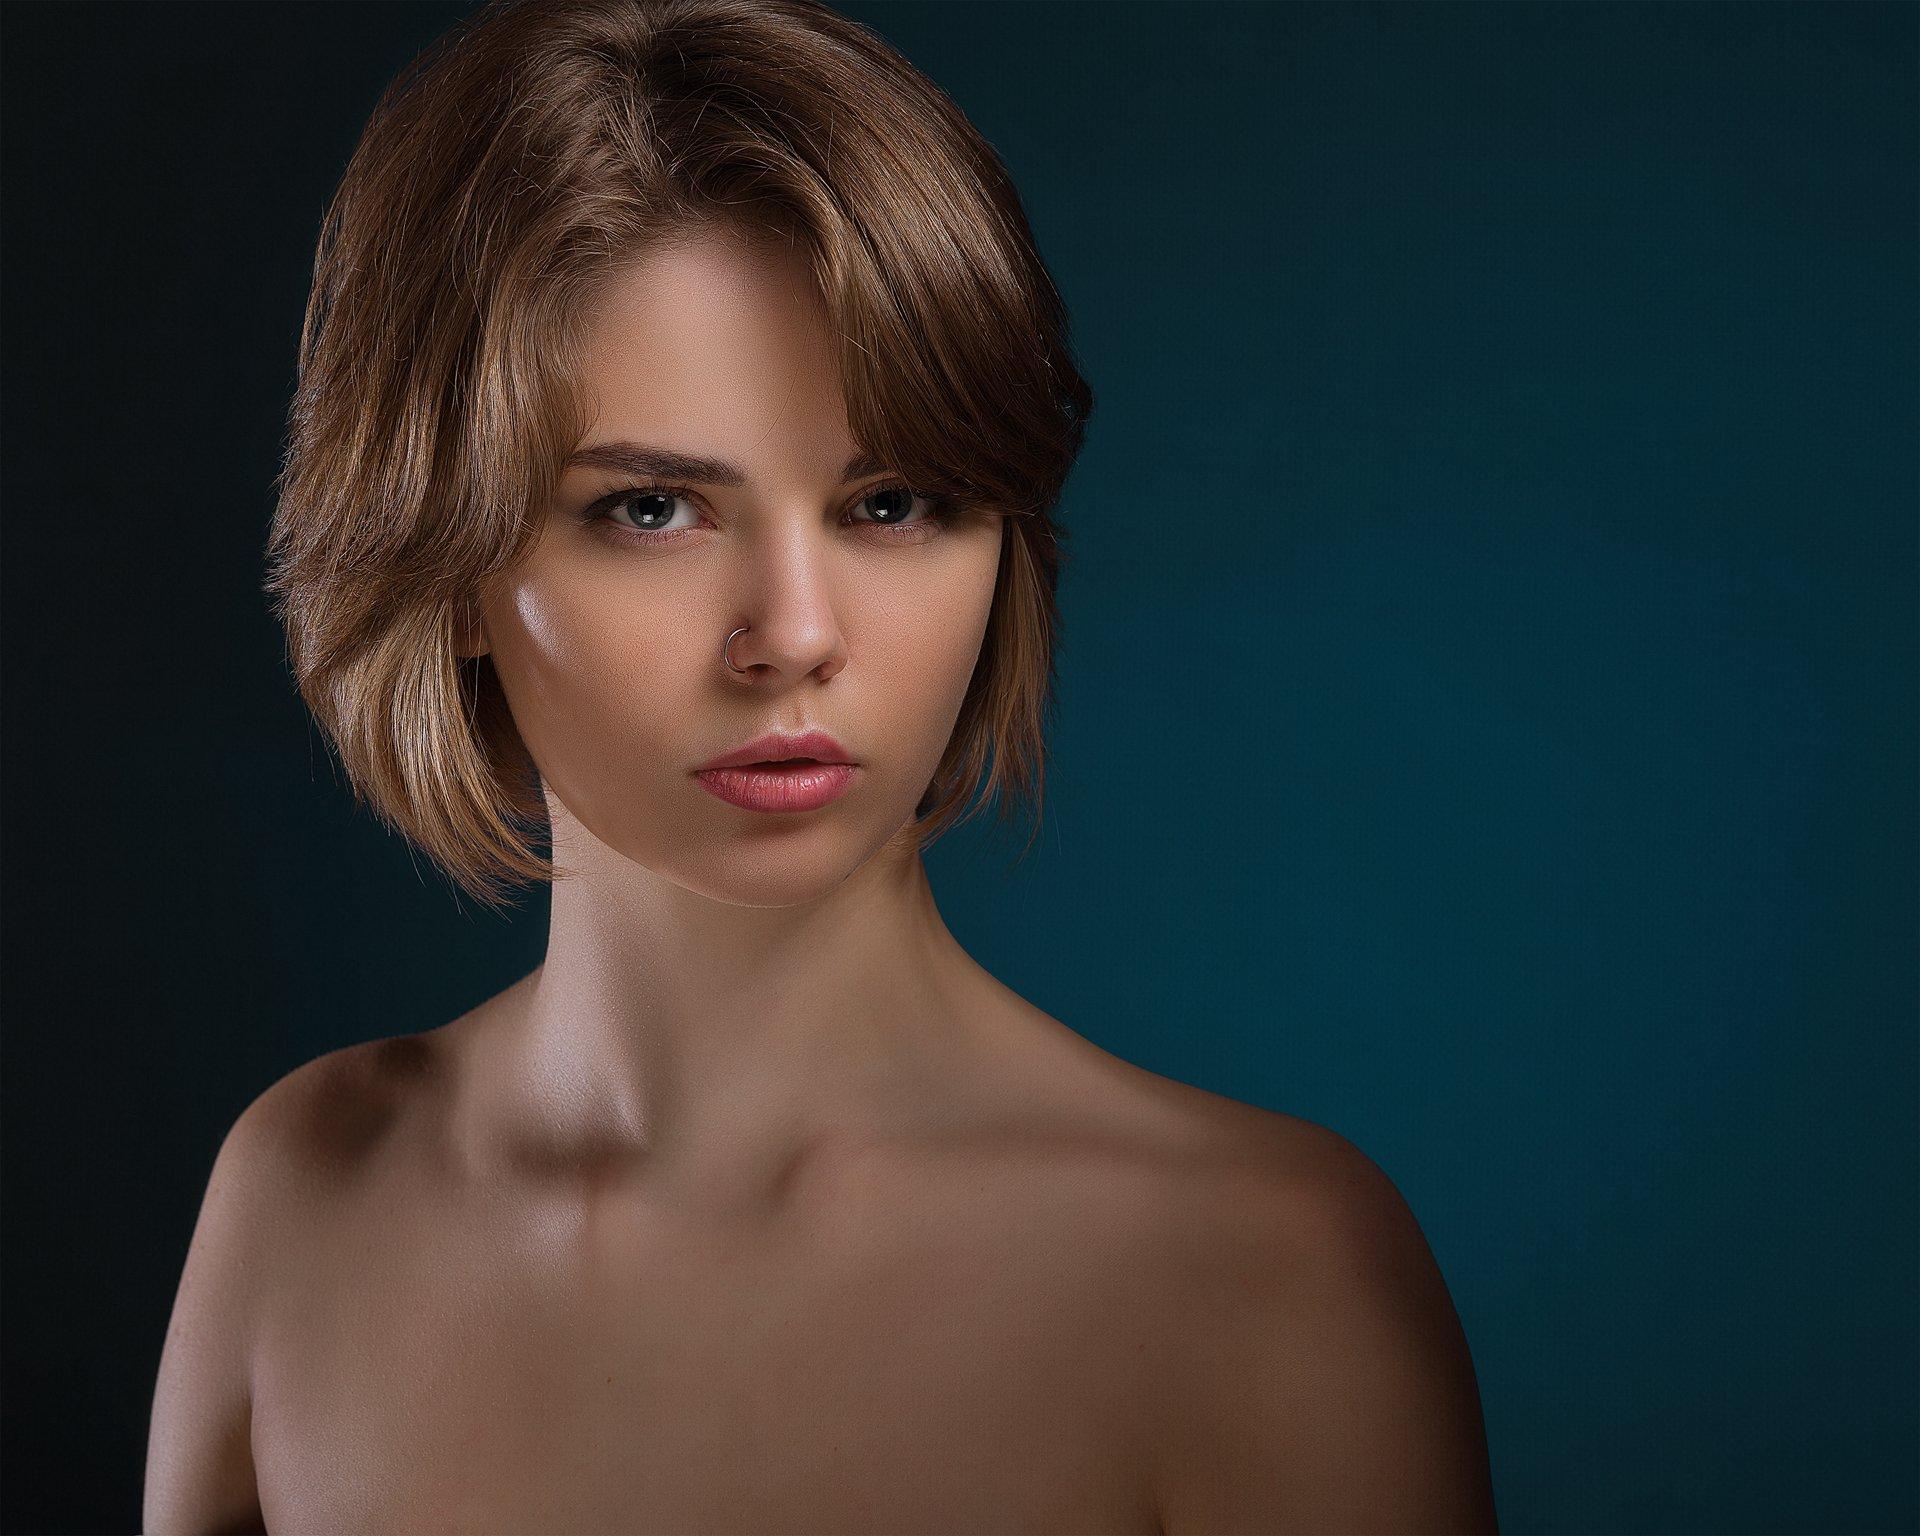 girl, model, beautiful, beauty, young, portrait, face, amazing, sensual, lovely, Евгений Сибиряев